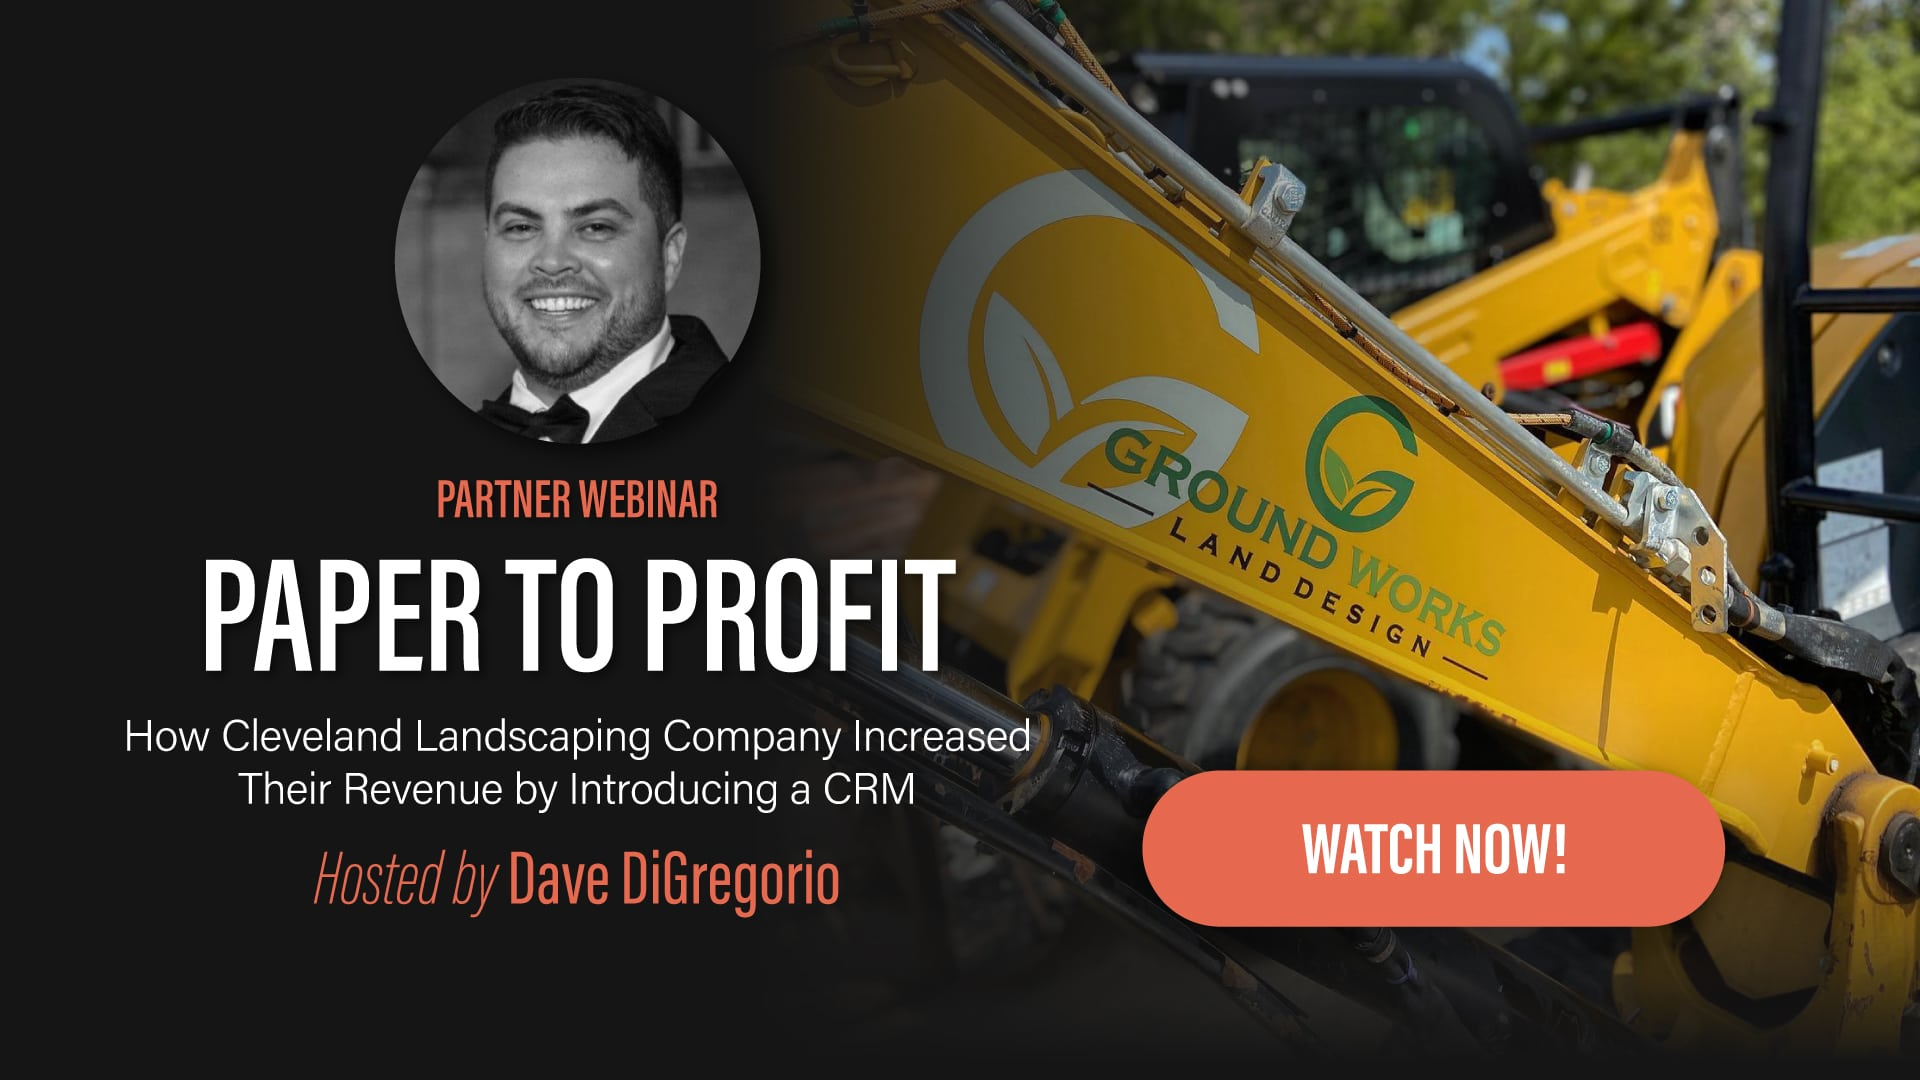 Dave DiGregorio Groundworks